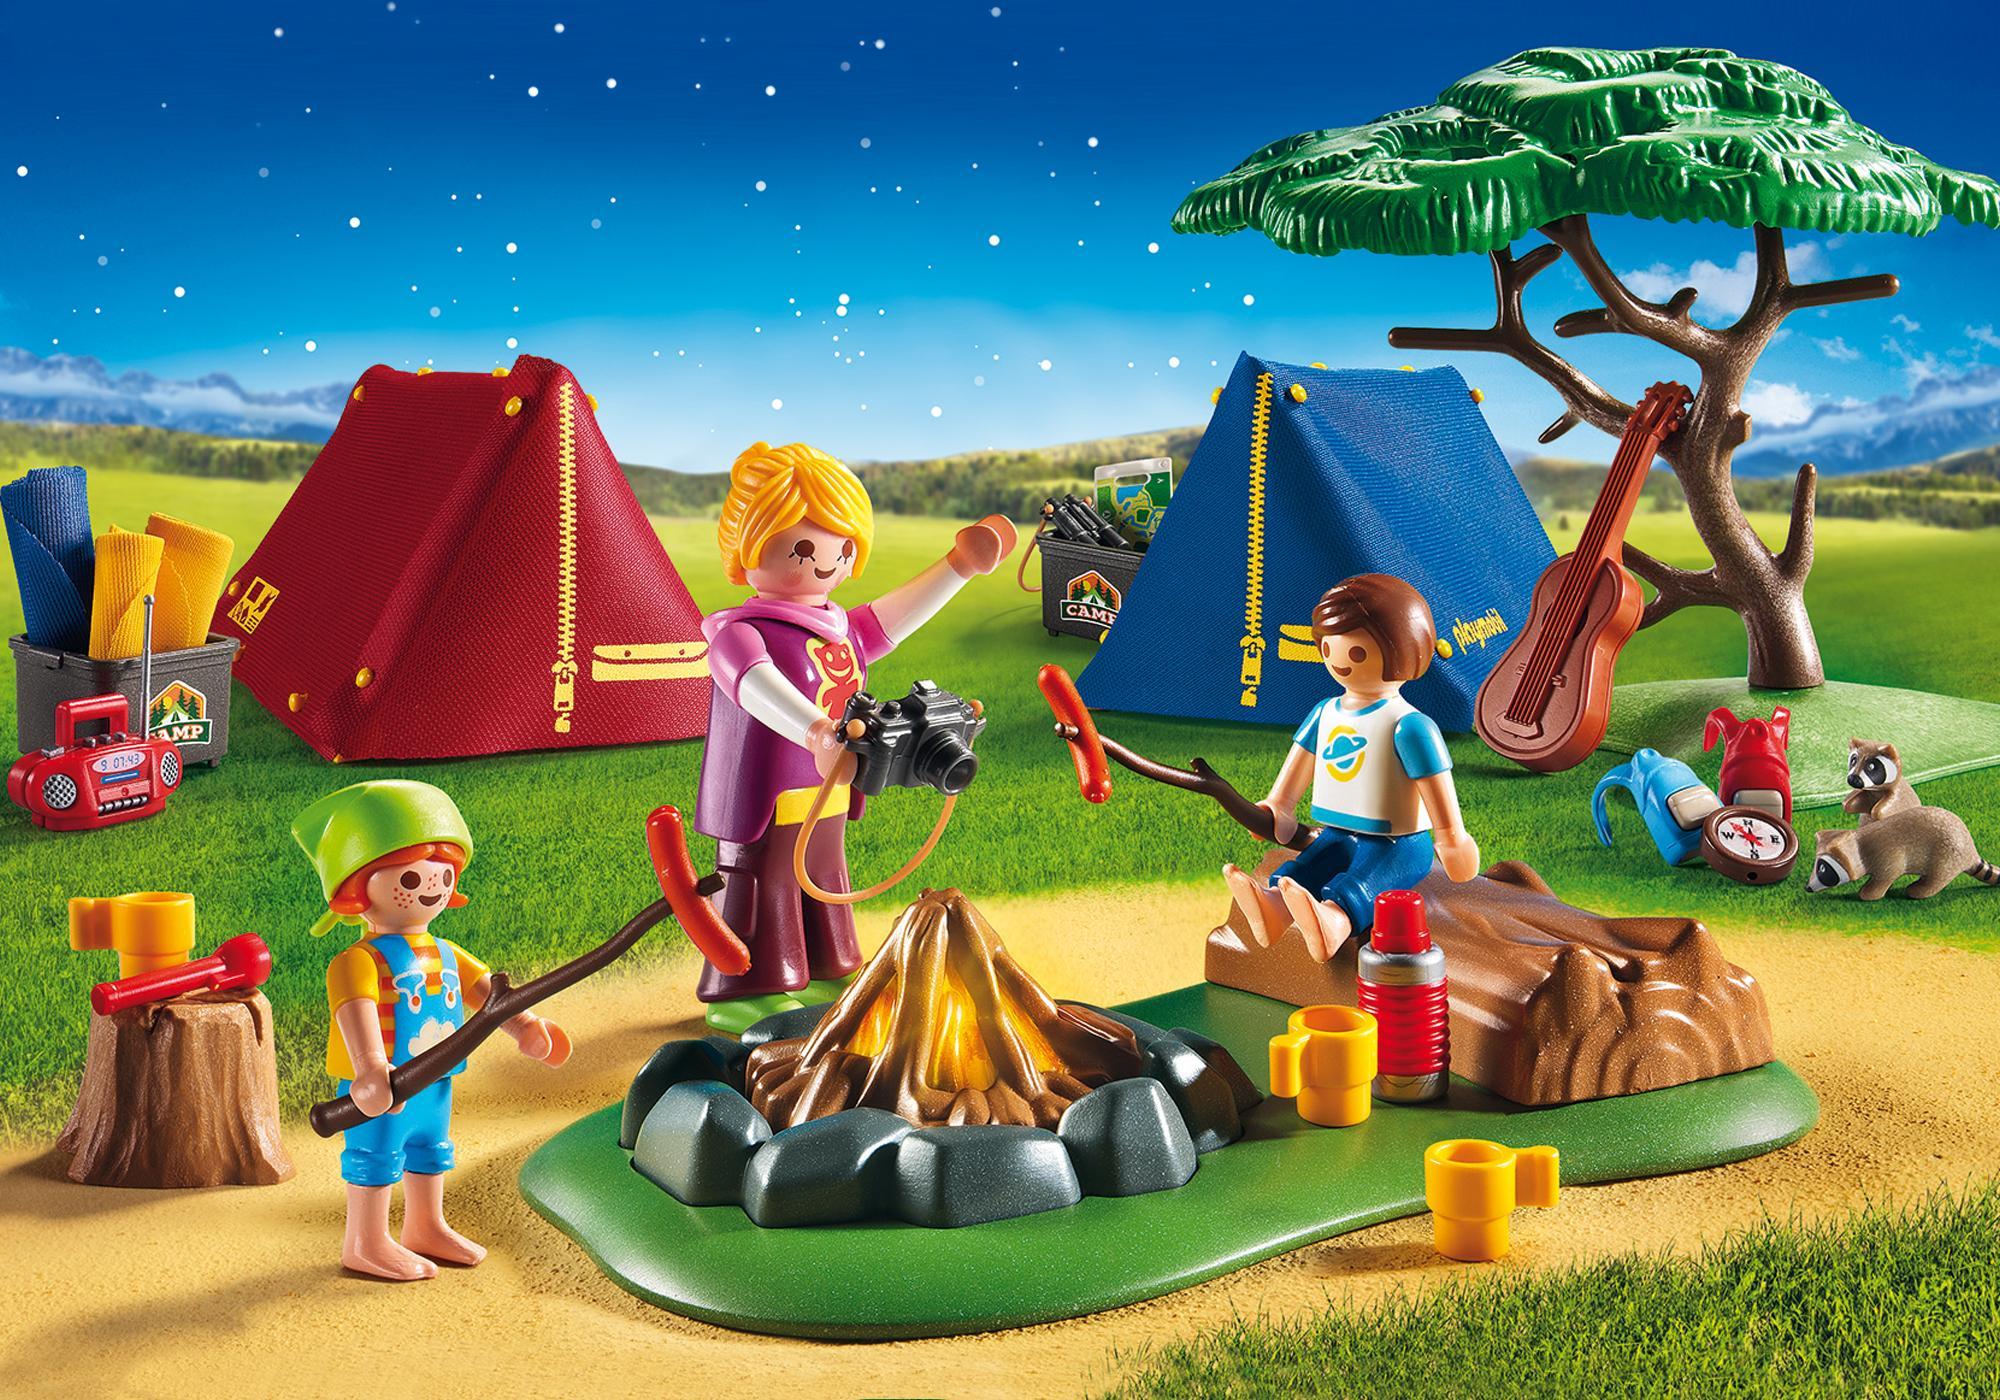 http://media.playmobil.com/i/playmobil/6888_product_detail